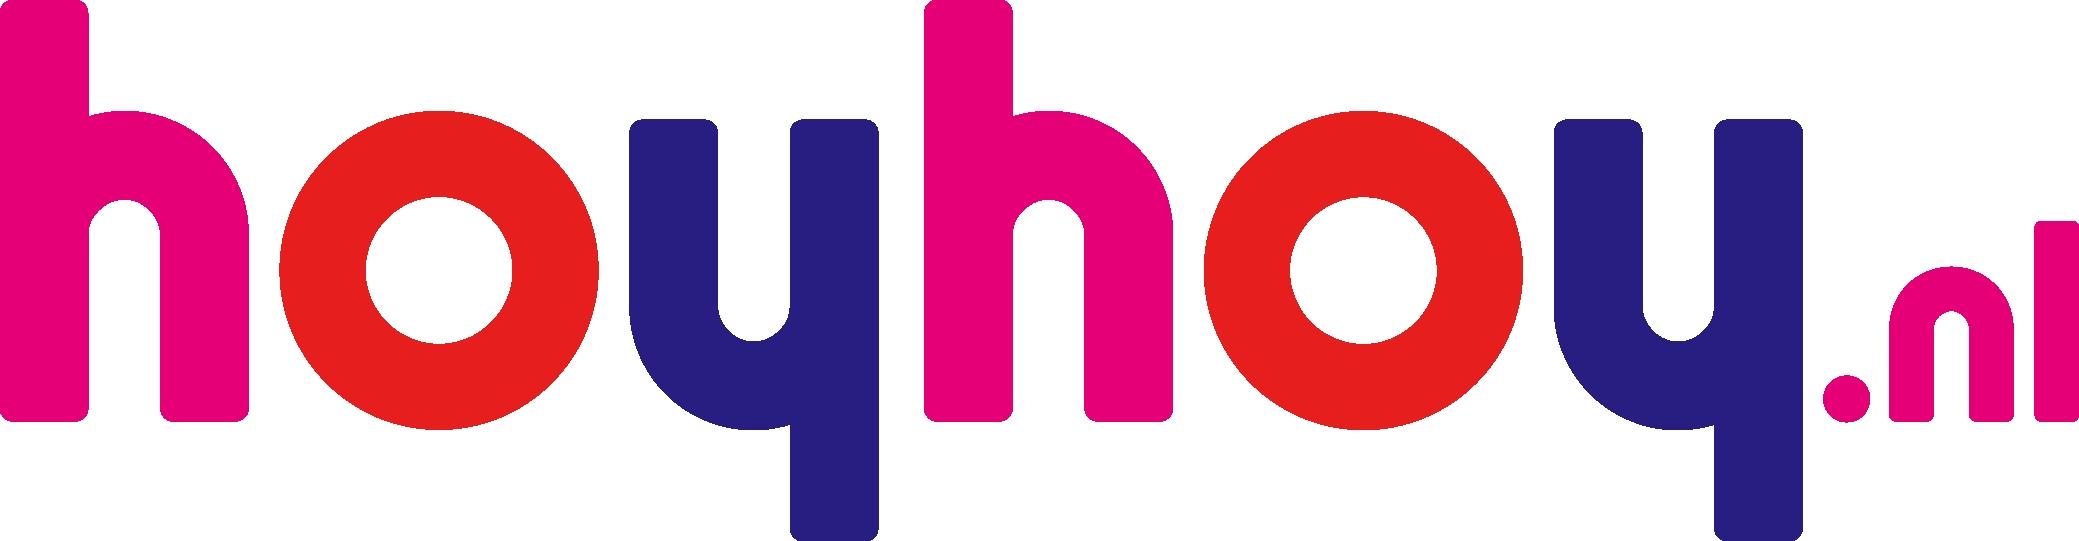 Bedrijfspresentatie Hoyhoy.nl